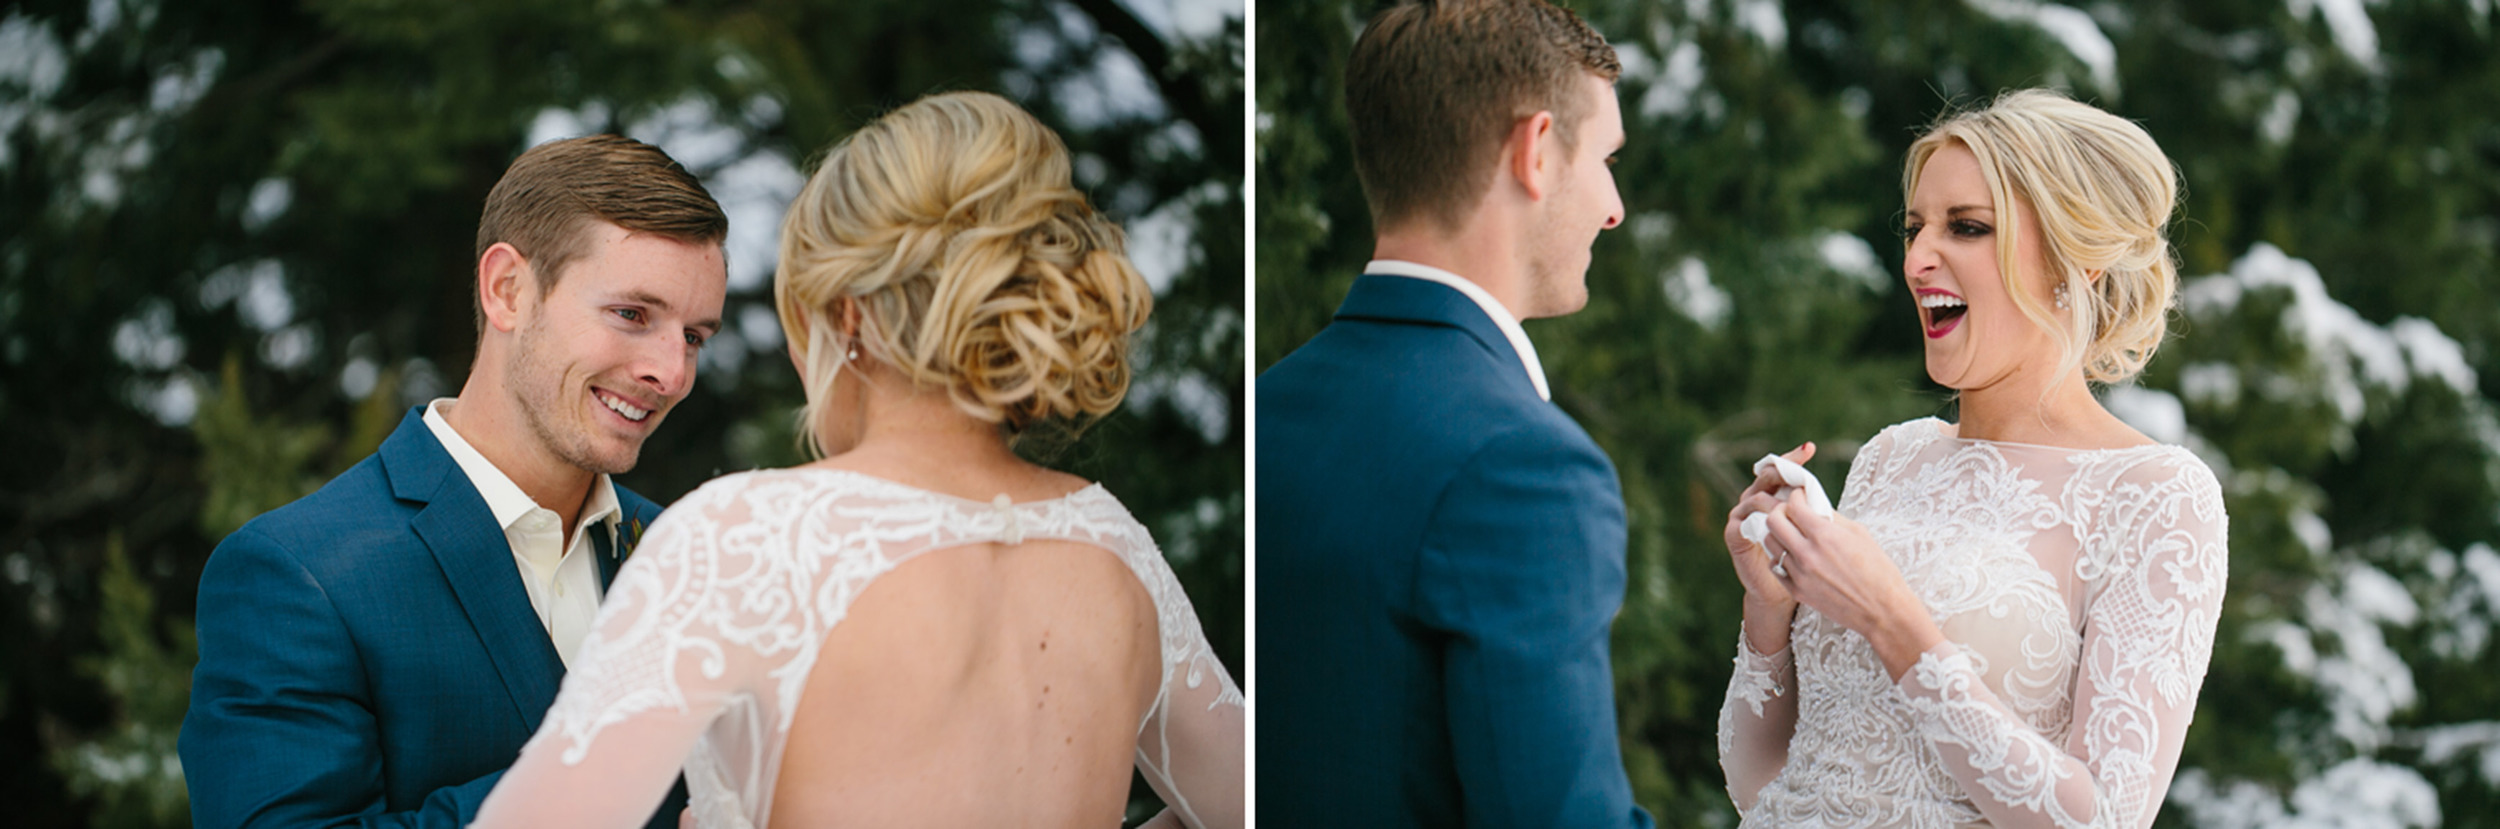 Cotton_Creek_Barn_Winter_Wedding_WeddingPhotographer018.jpg